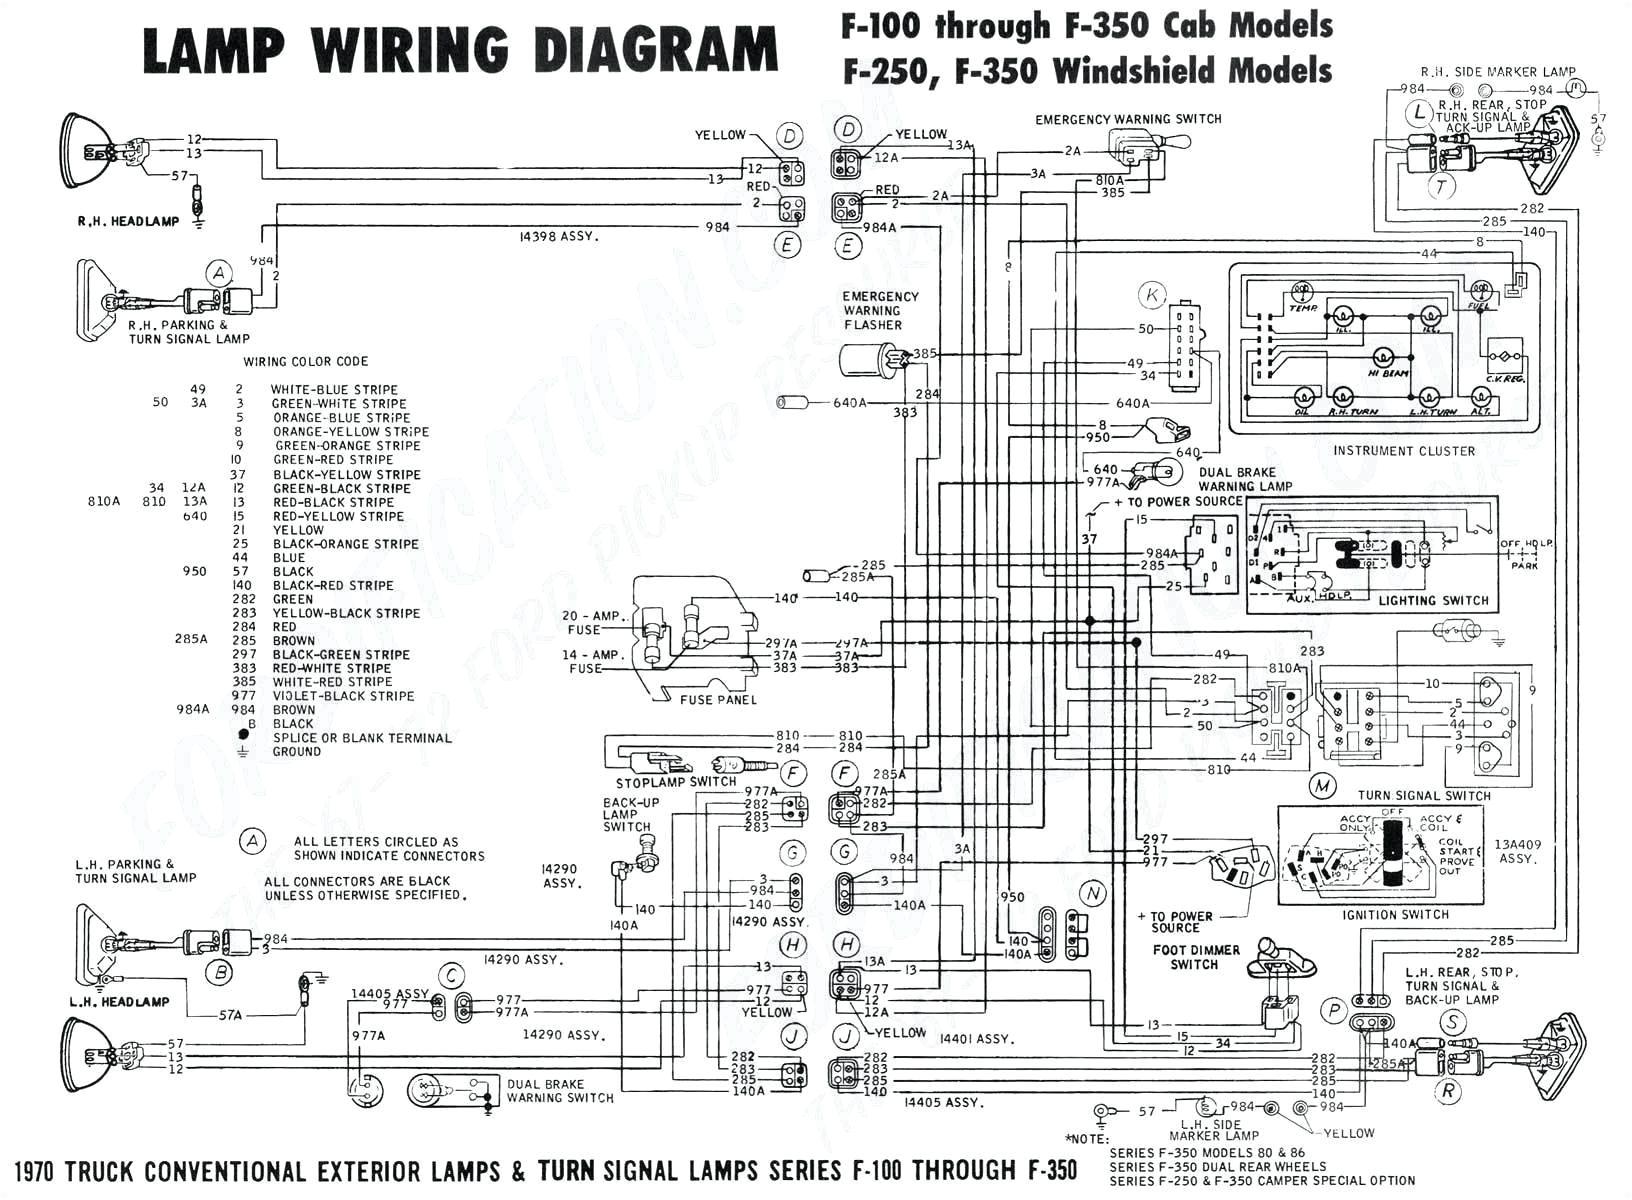 1983 Chevy Truck Wiring Diagram Chevy Silverado Radio Fuse Location 1957 Chevy Truck Heater Wiring